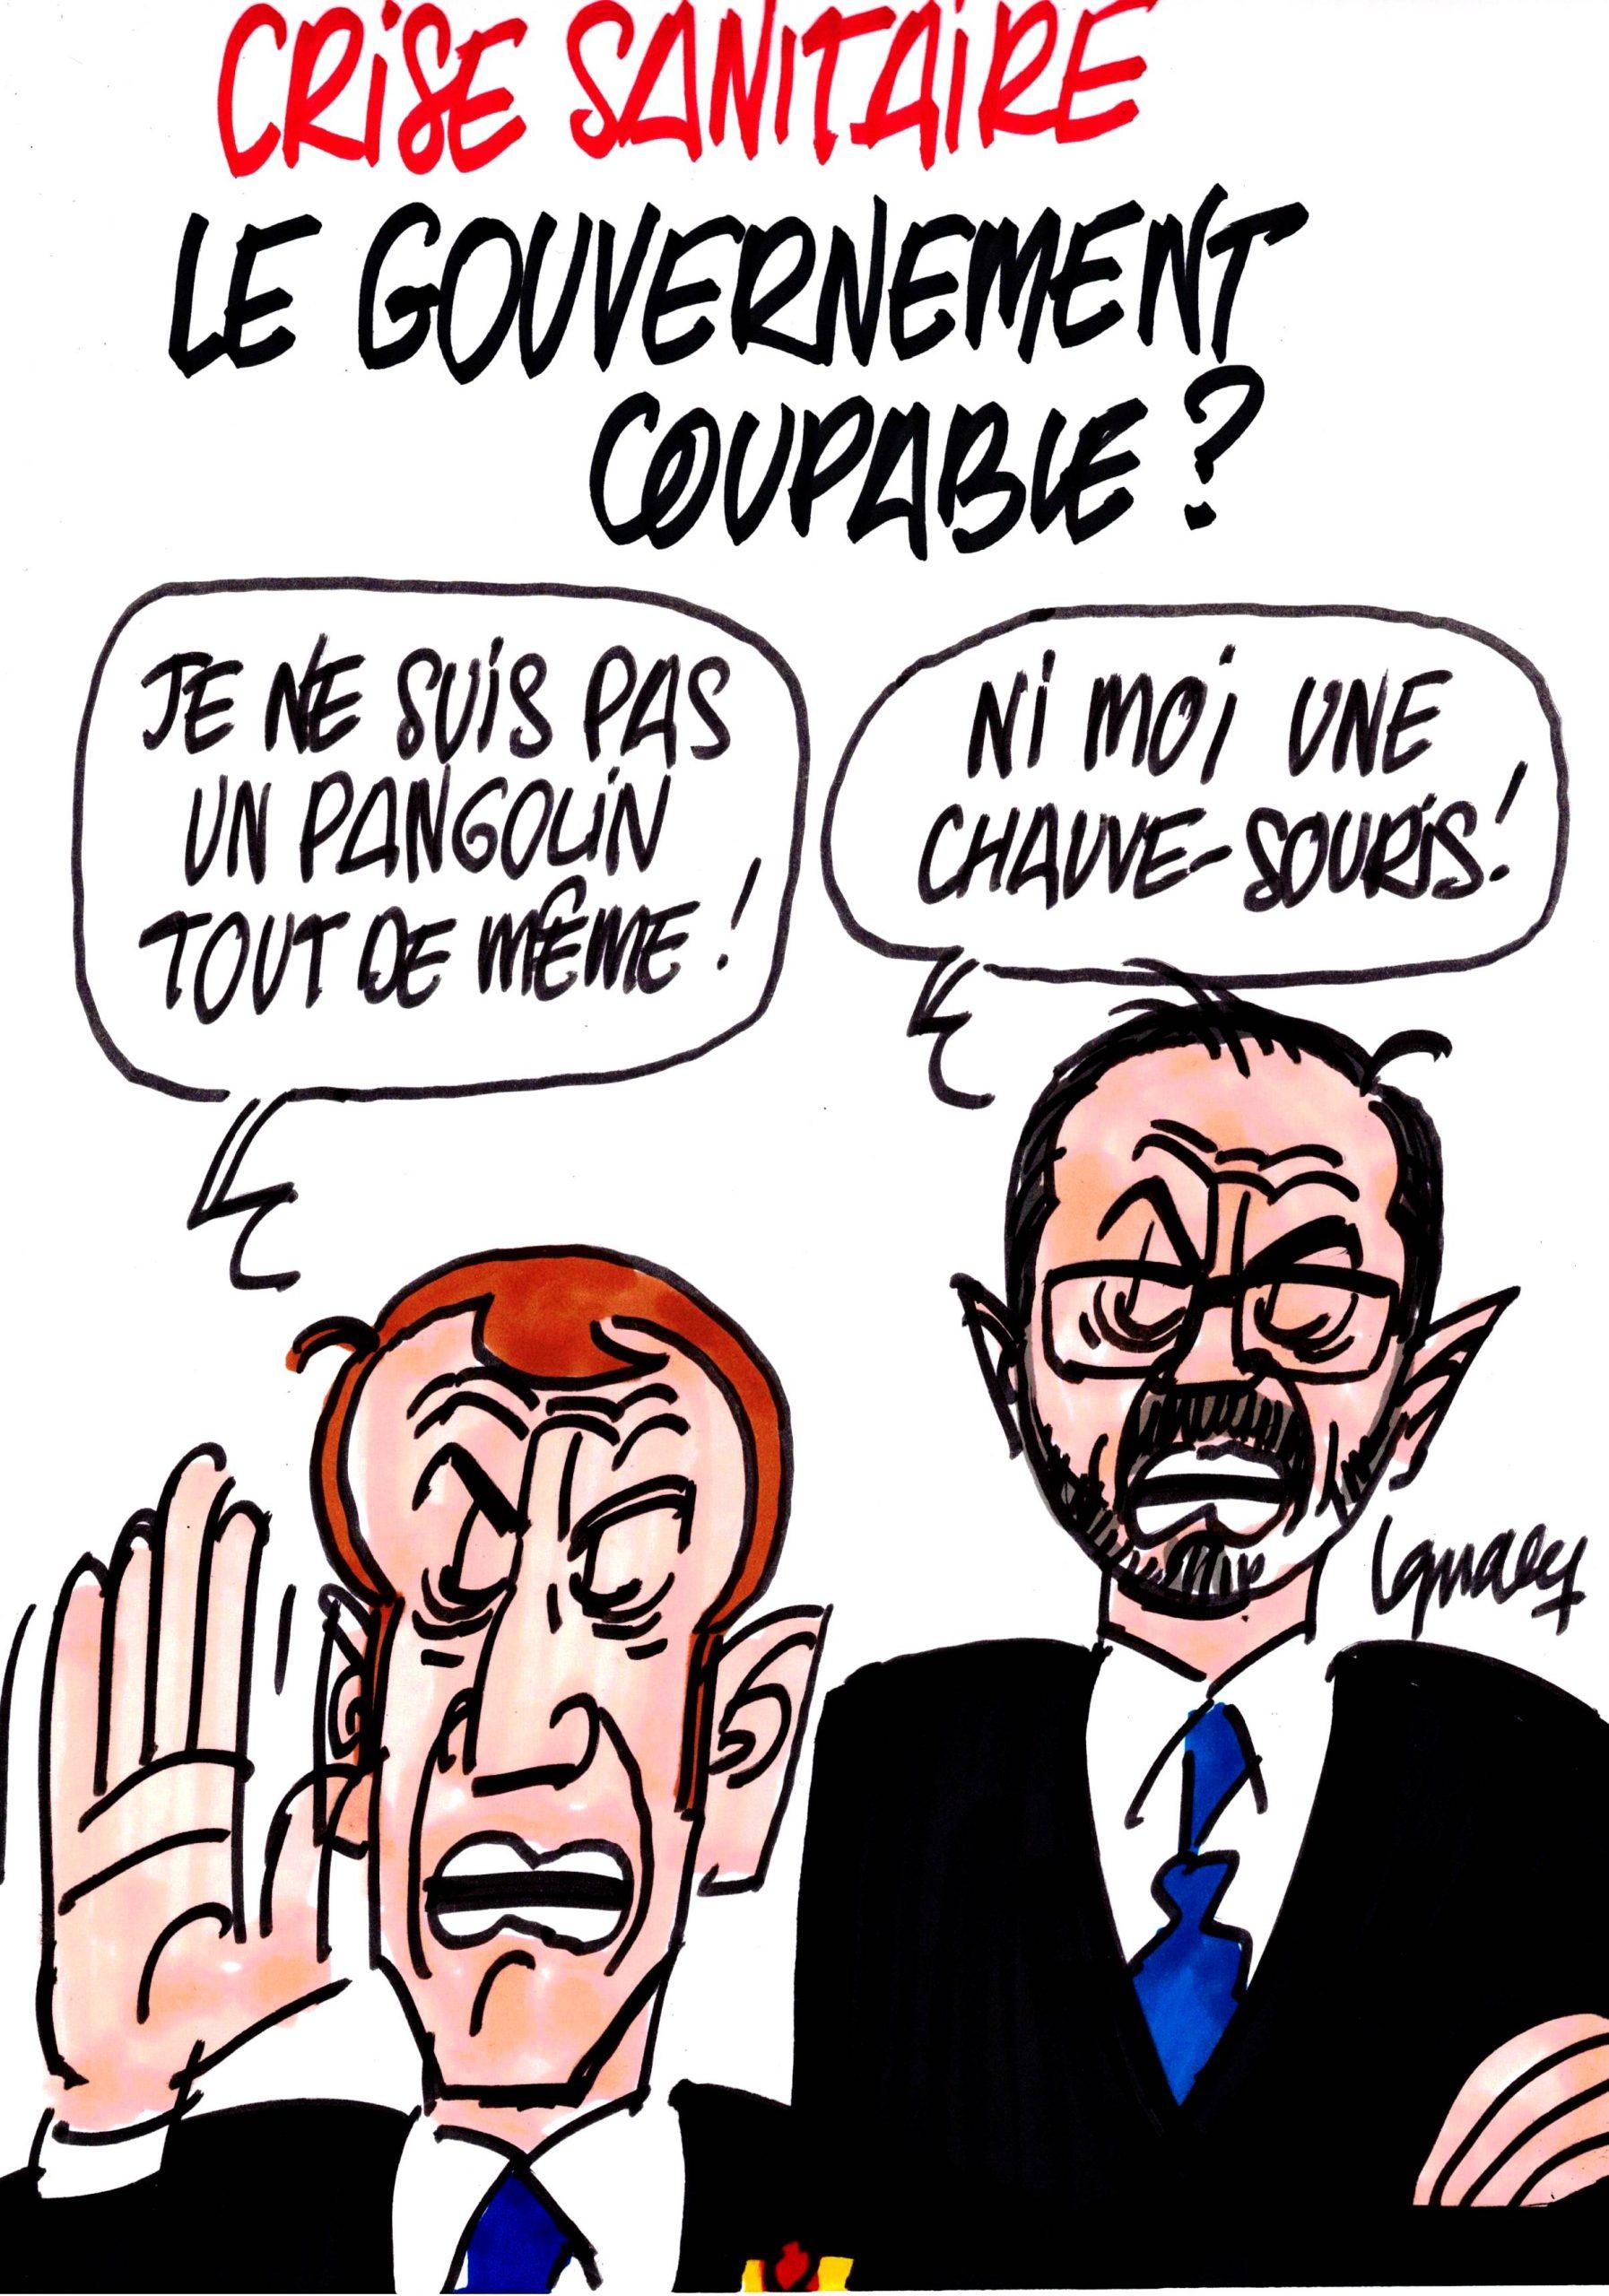 Ignace - Gouvernement coupable ?